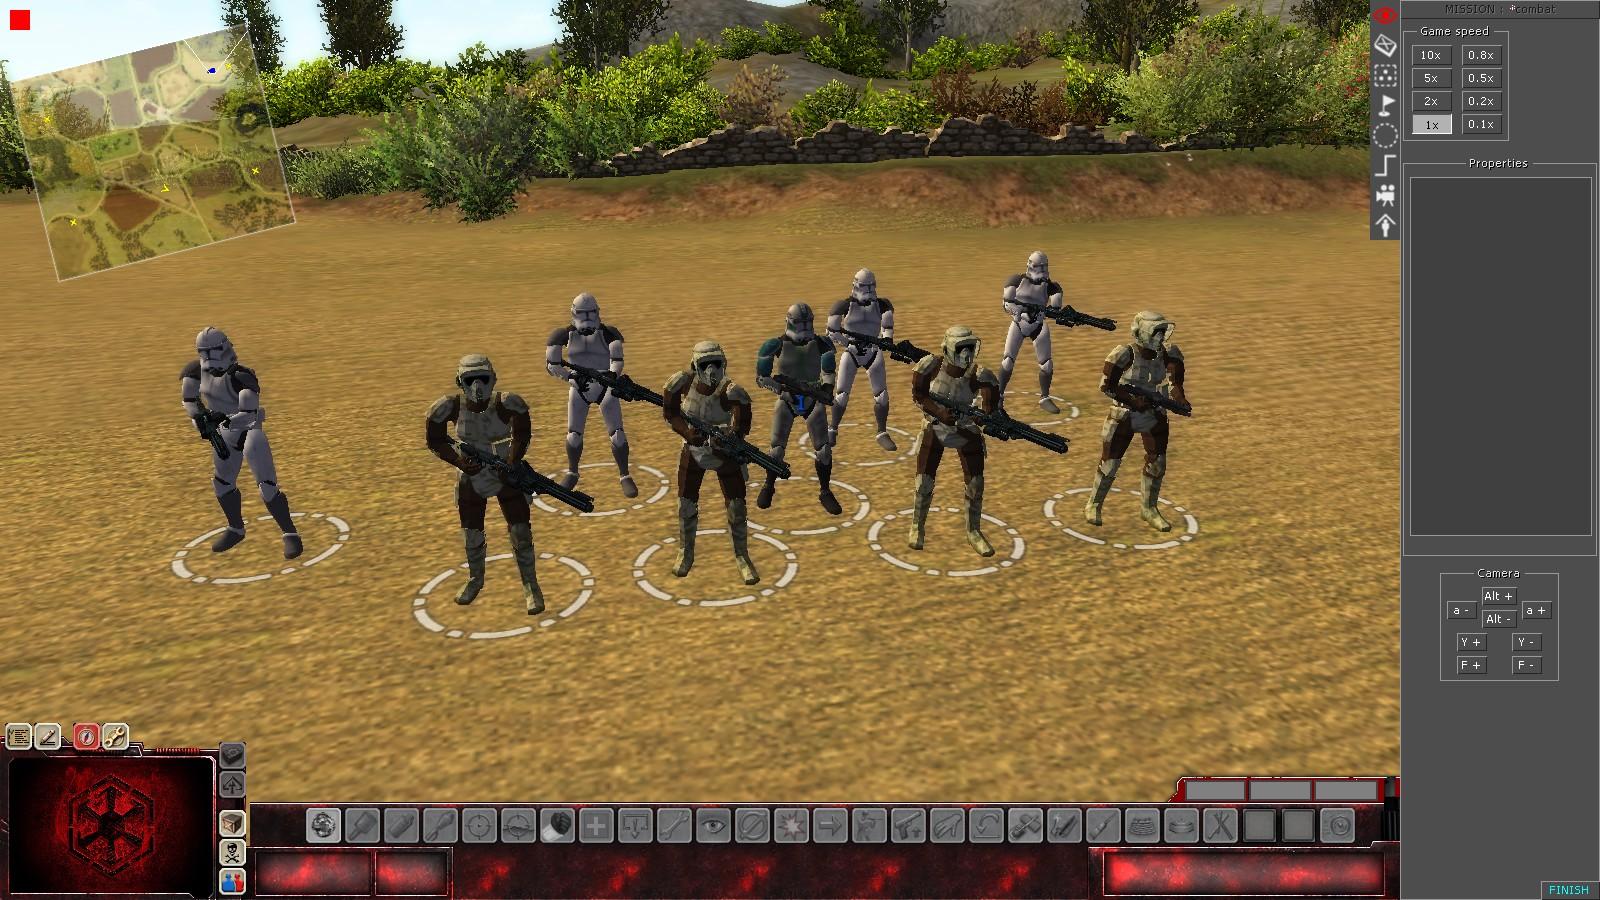 41 Elite 41st elite corps image - star wars - galaxy at war mod for